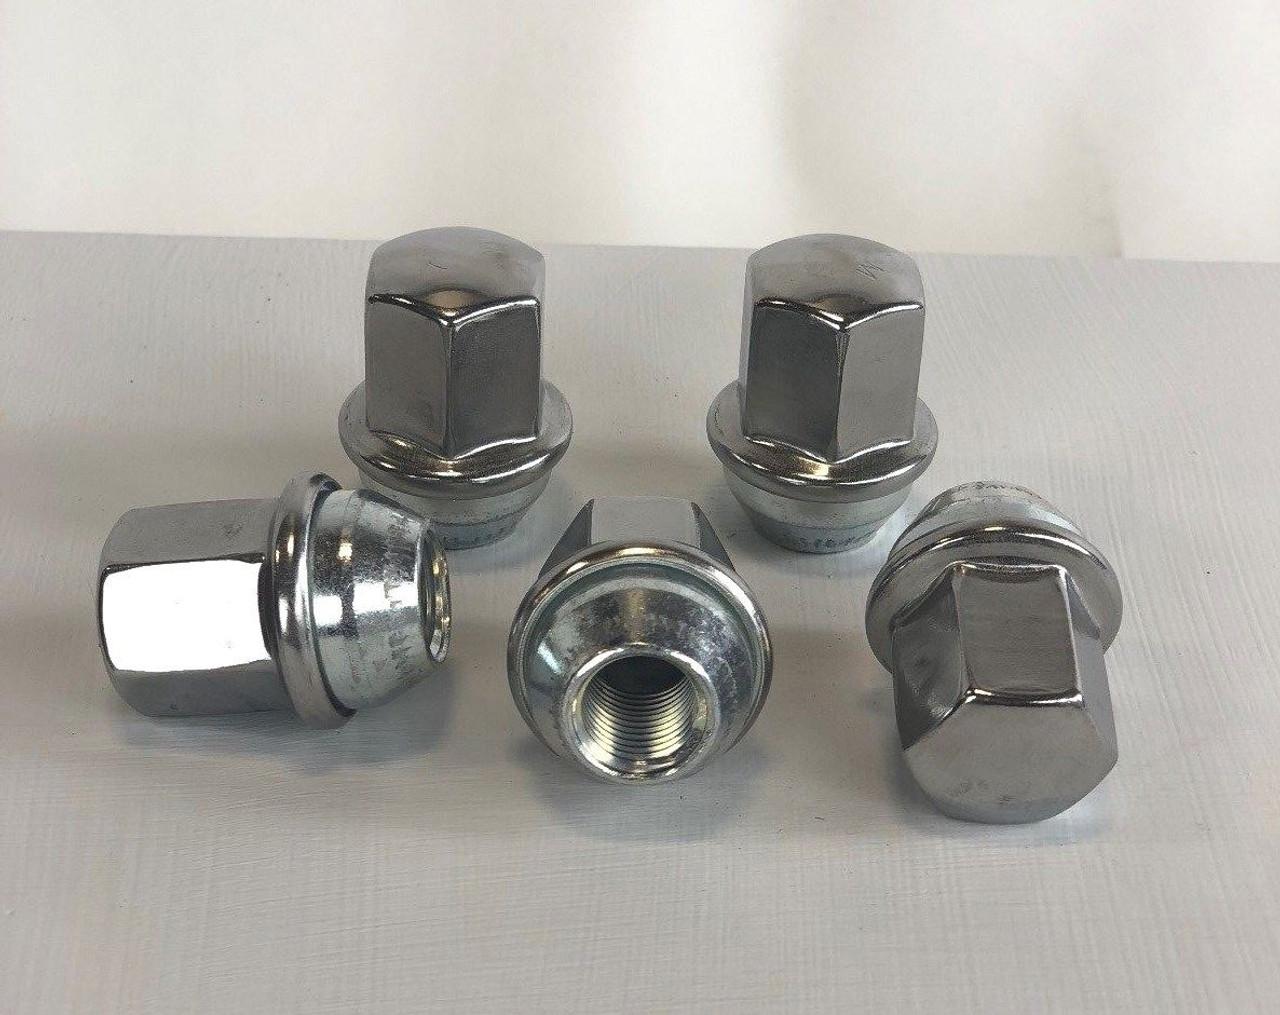 Set of 32 Dodge Ram 2500 3500 Factory OEM 14mm X 1.5mm New Polished Lug Nuts